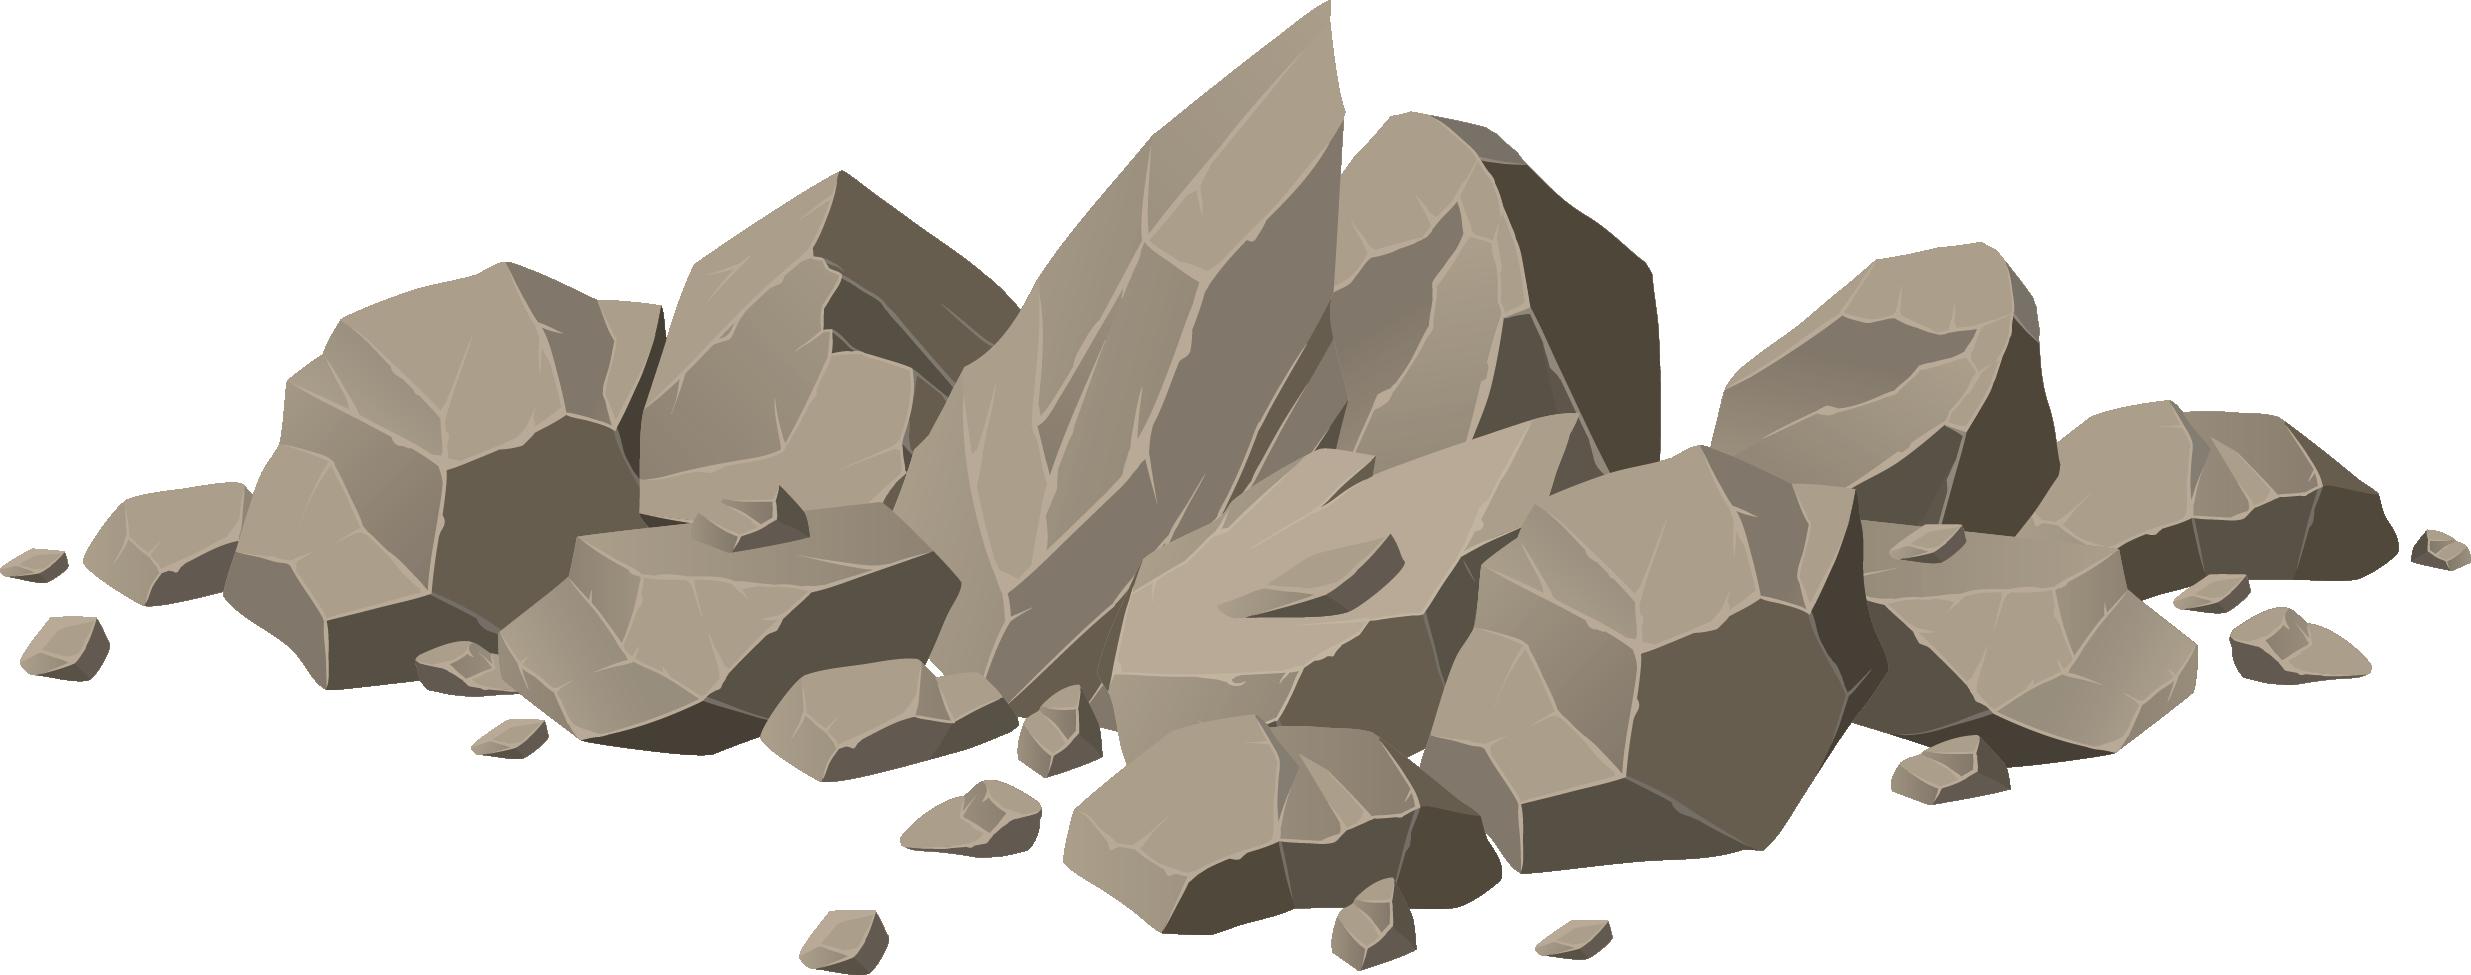 Royalty free illustration stone. Boulder clipart brown rock